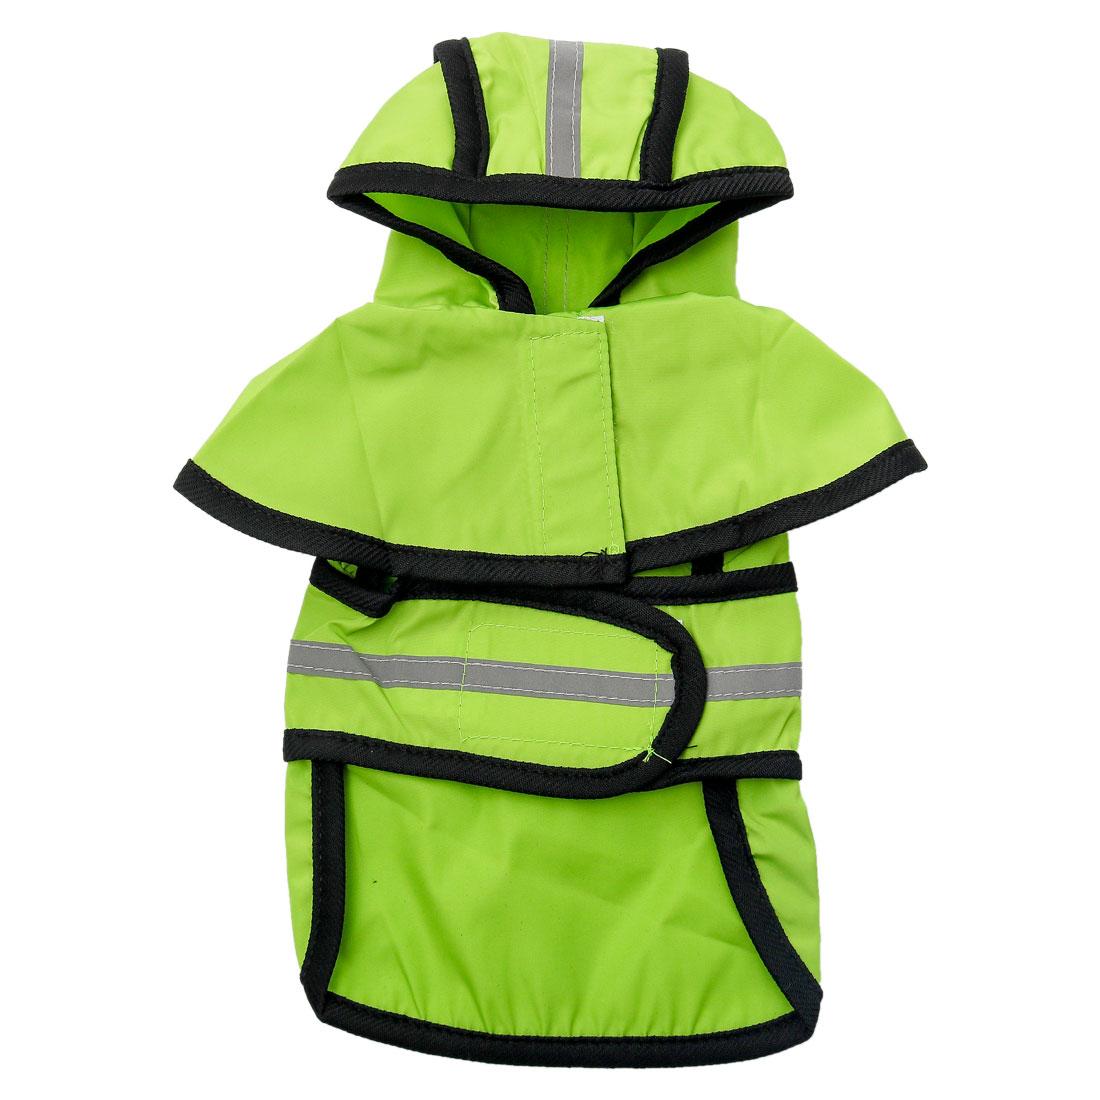 Pet Dogs Raincoat Rain Jacket Poncho Cloth Water-resistant Rainwears Green S